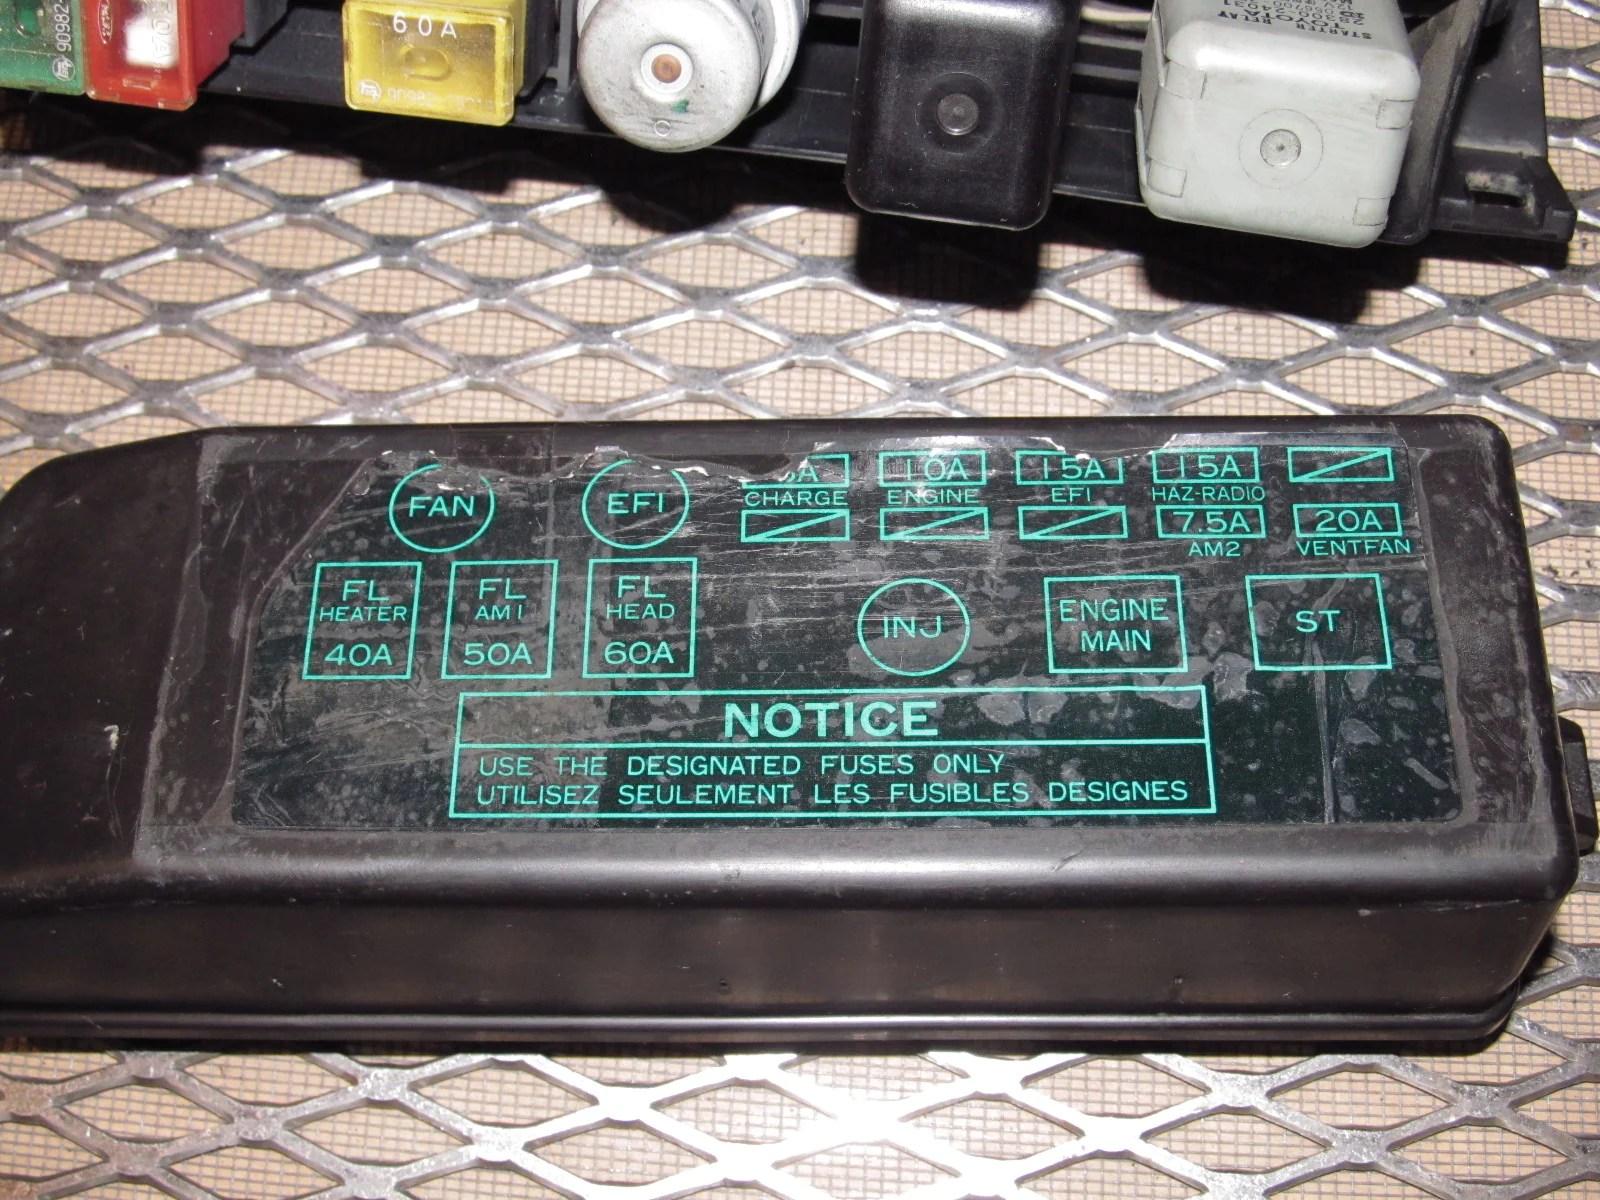 87 rx7 fuse box wiring diagram blog [ 1600 x 1200 Pixel ]